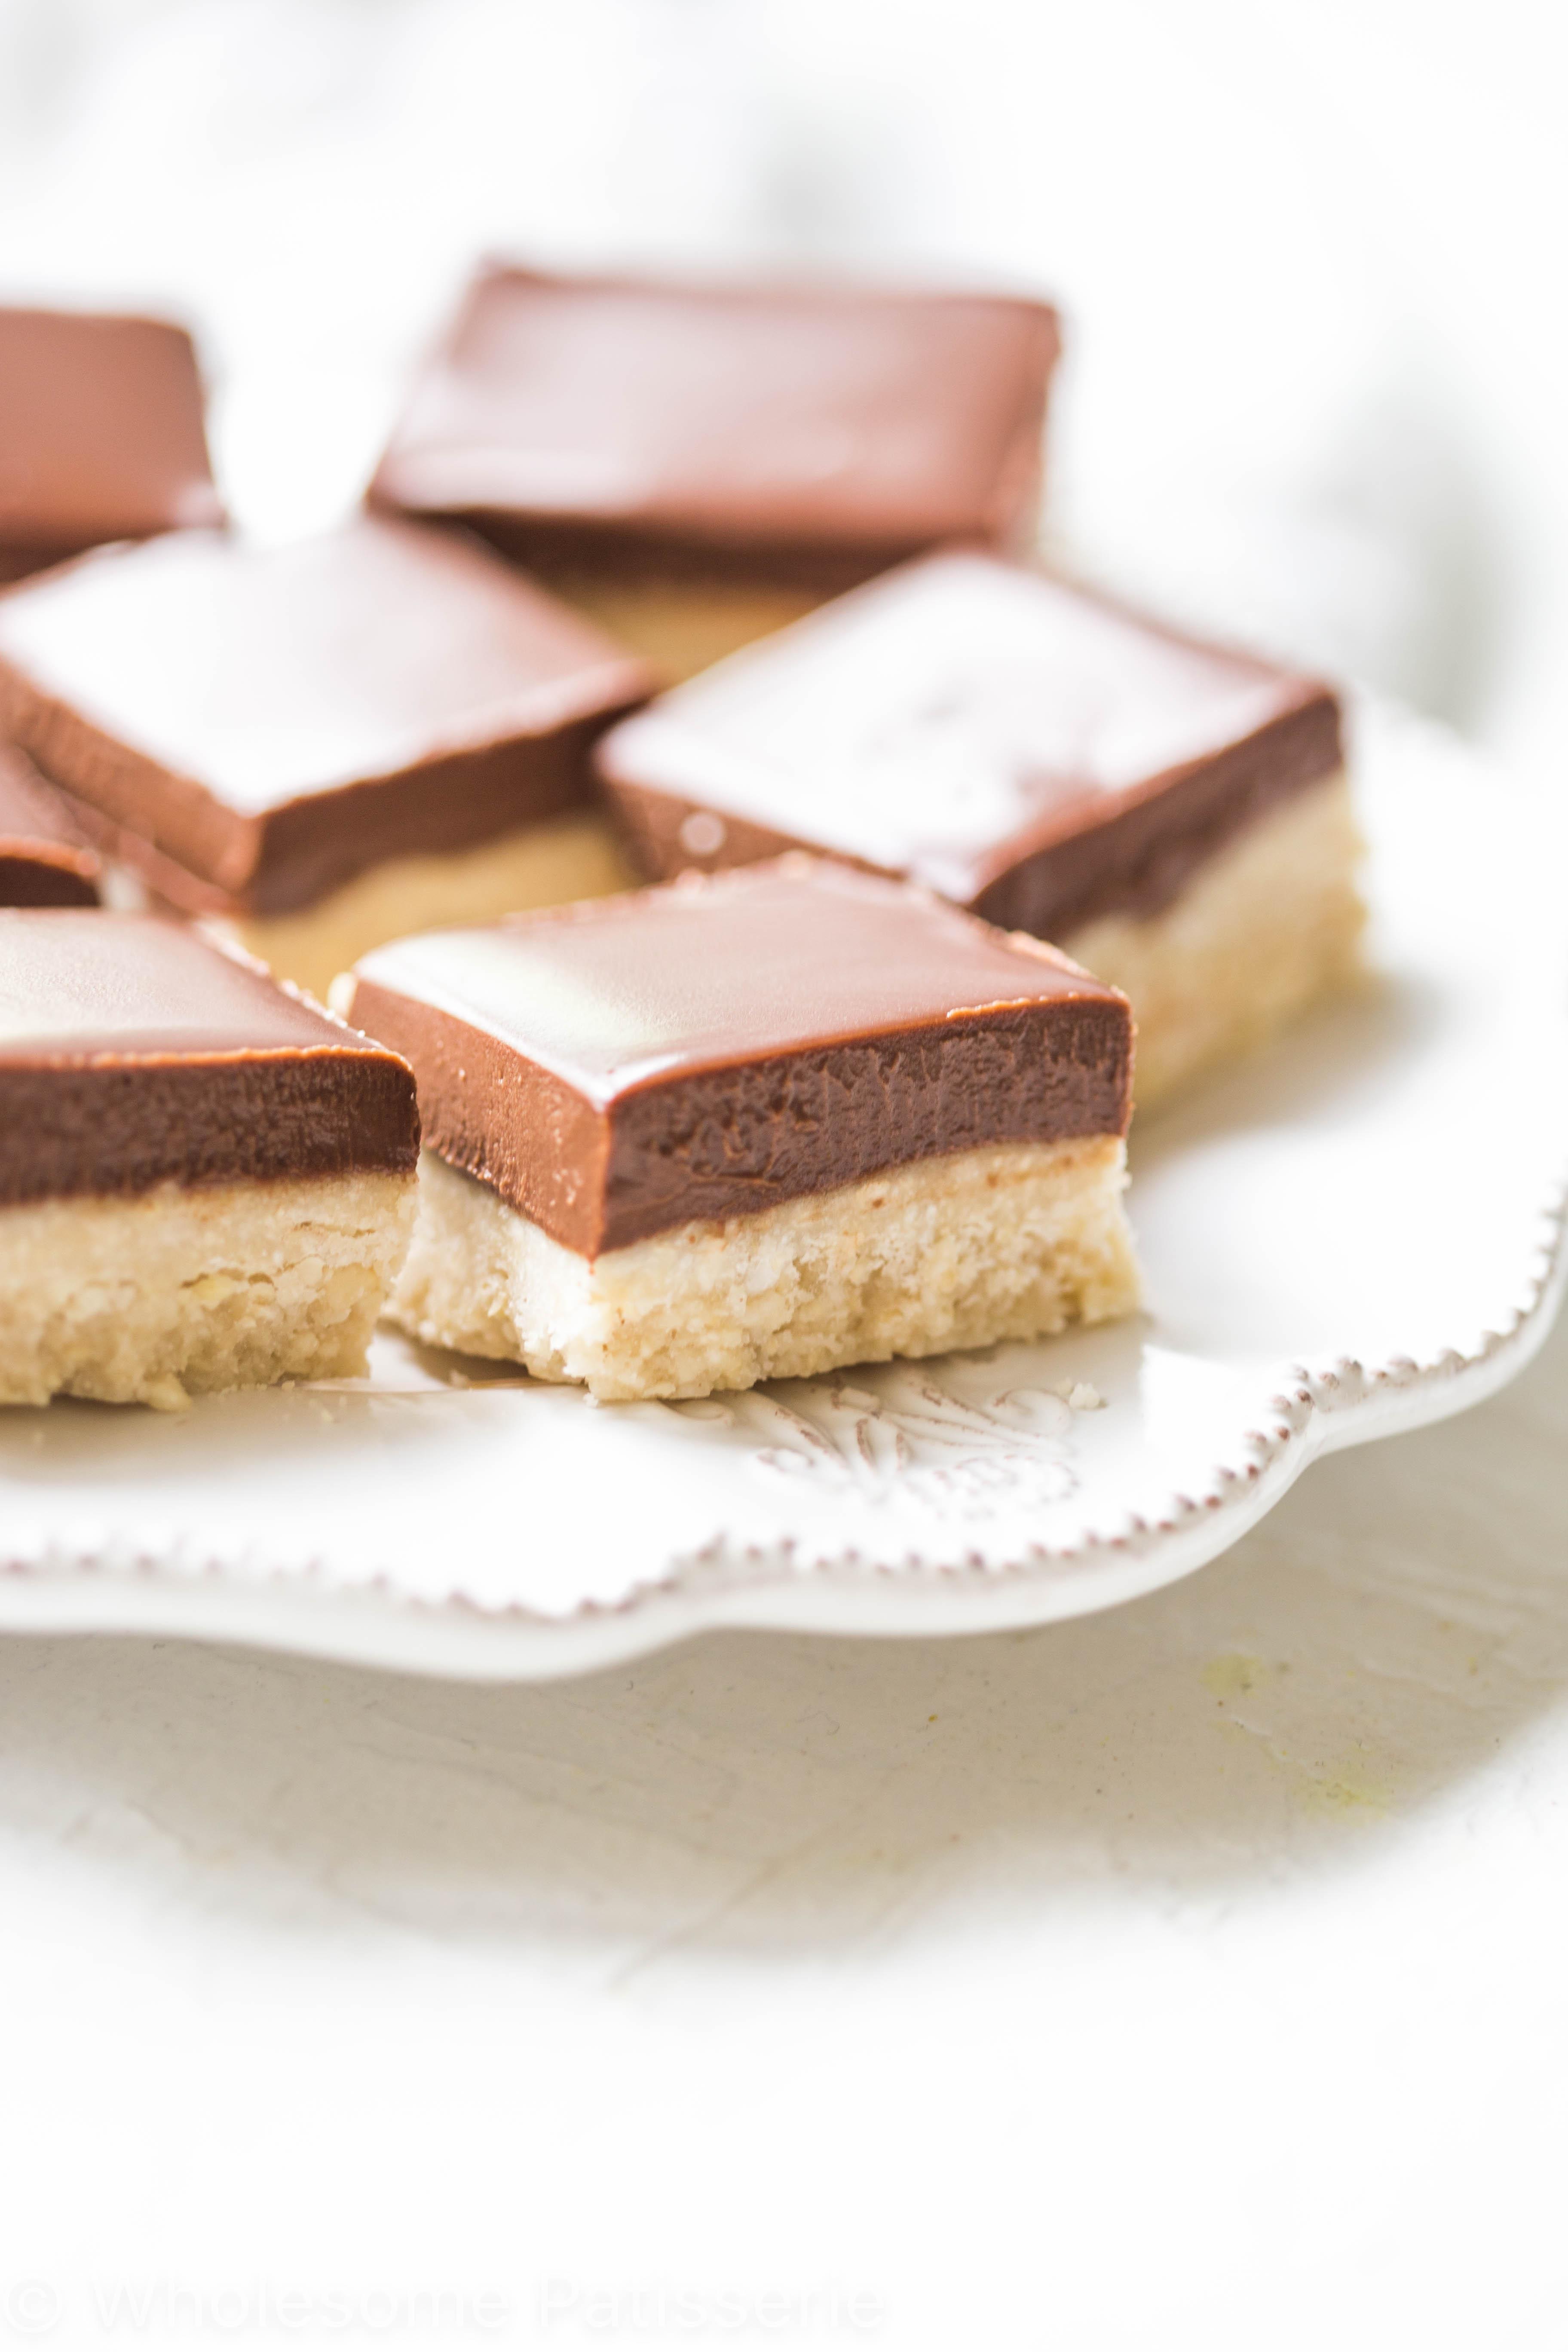 amazing-decadent-gluten-free-vegan-mint-slice-no-bake